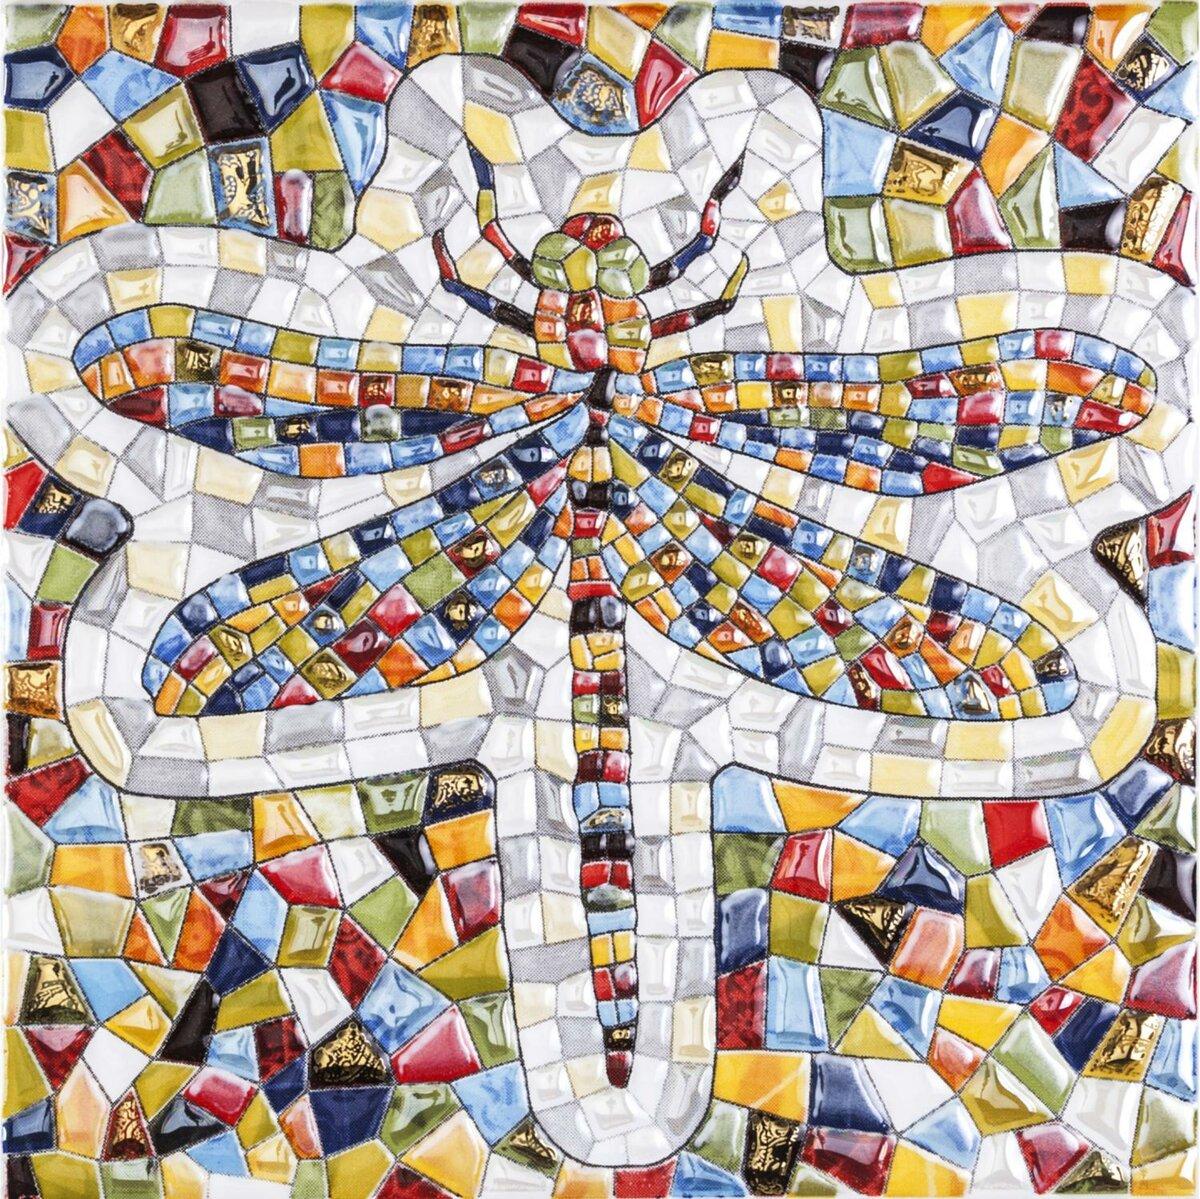 мозаика разная картинки тому же, коржи